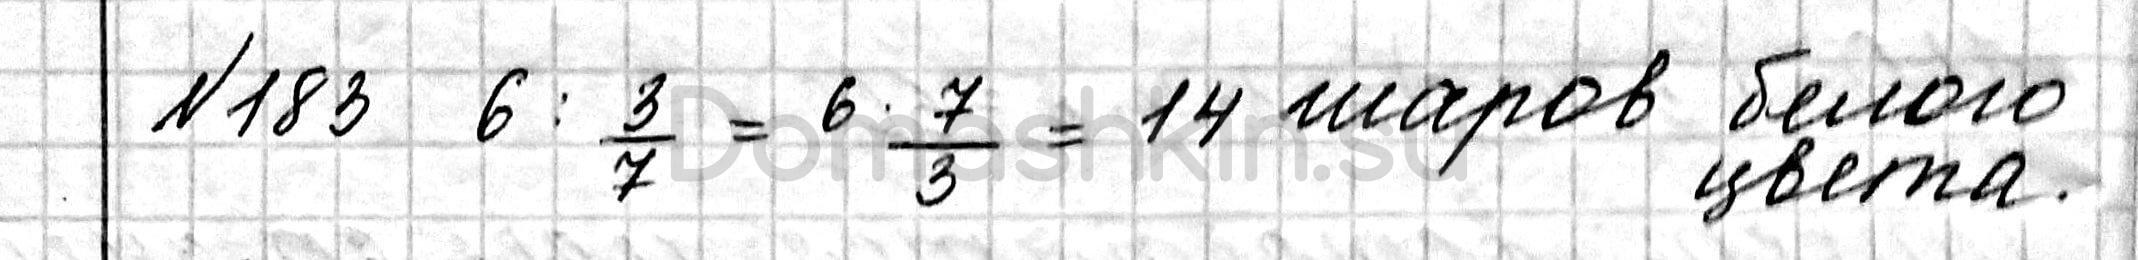 Математика 6 класс учебник Мерзляк номер 183 решение